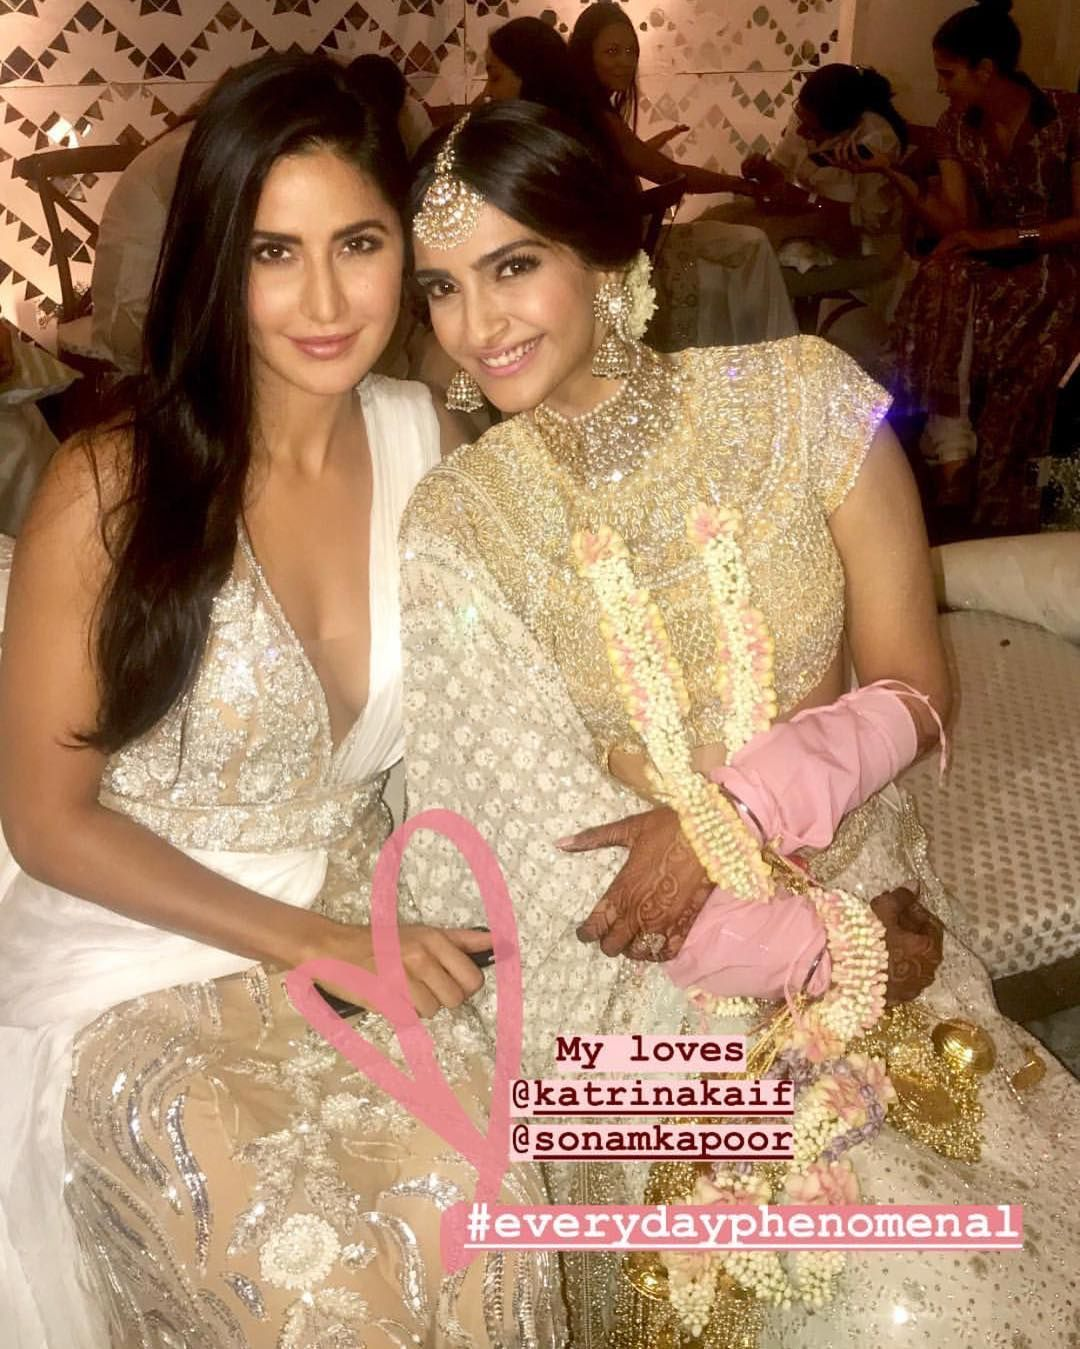 The Gorgeous Katrinakaif Poses With Bride To Be Sonamkapoor At Her Mehendi Ceremony Sonamkishaad Bollywood Celebrities Celebrity Weddings Bollywood Actress